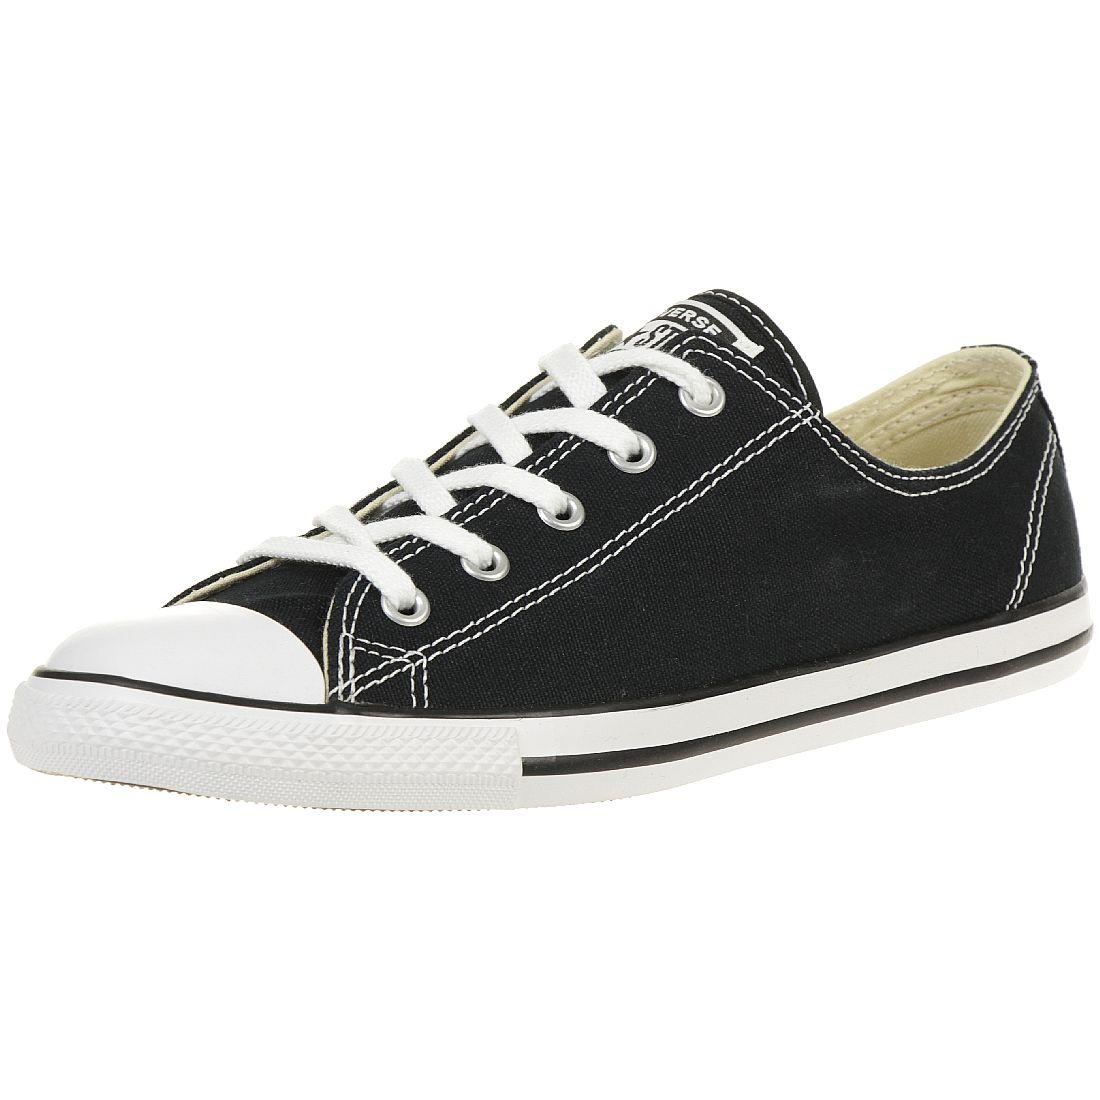 Converse CT AS Dainty Ox Chucks Schuhe Damen Sneaker 530054C